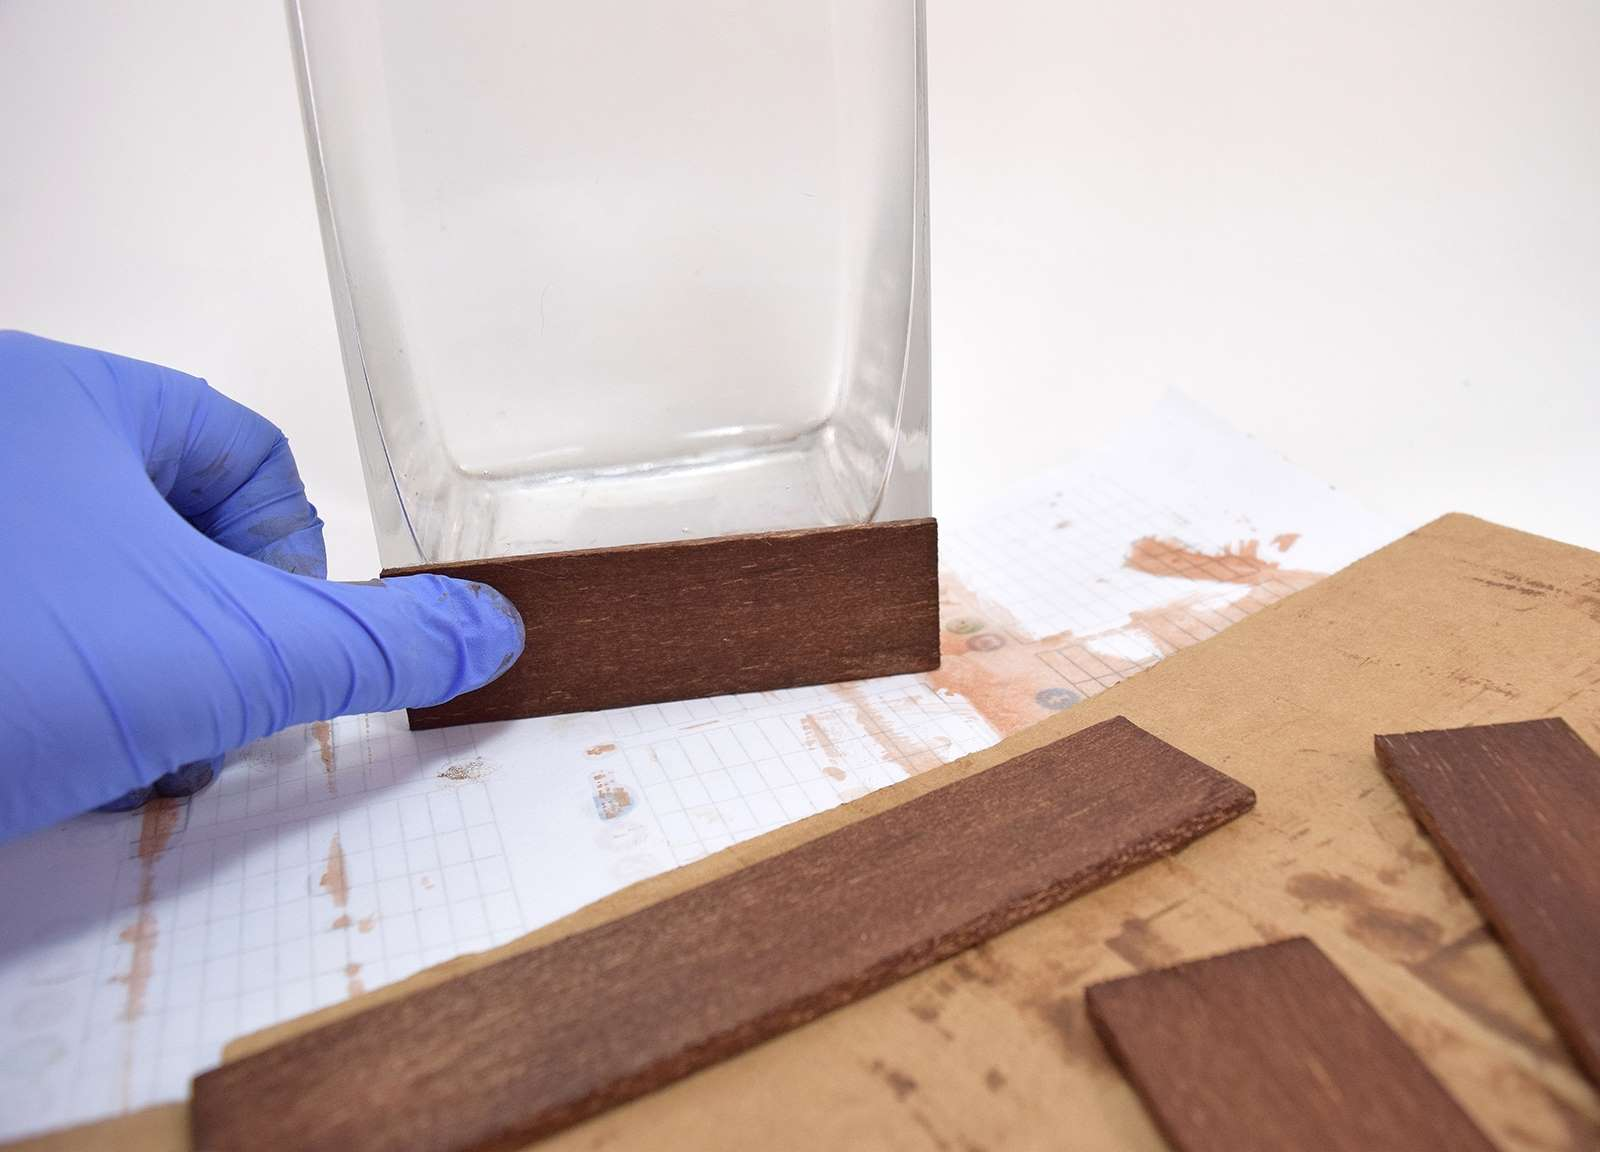 Glue Wood To Glass